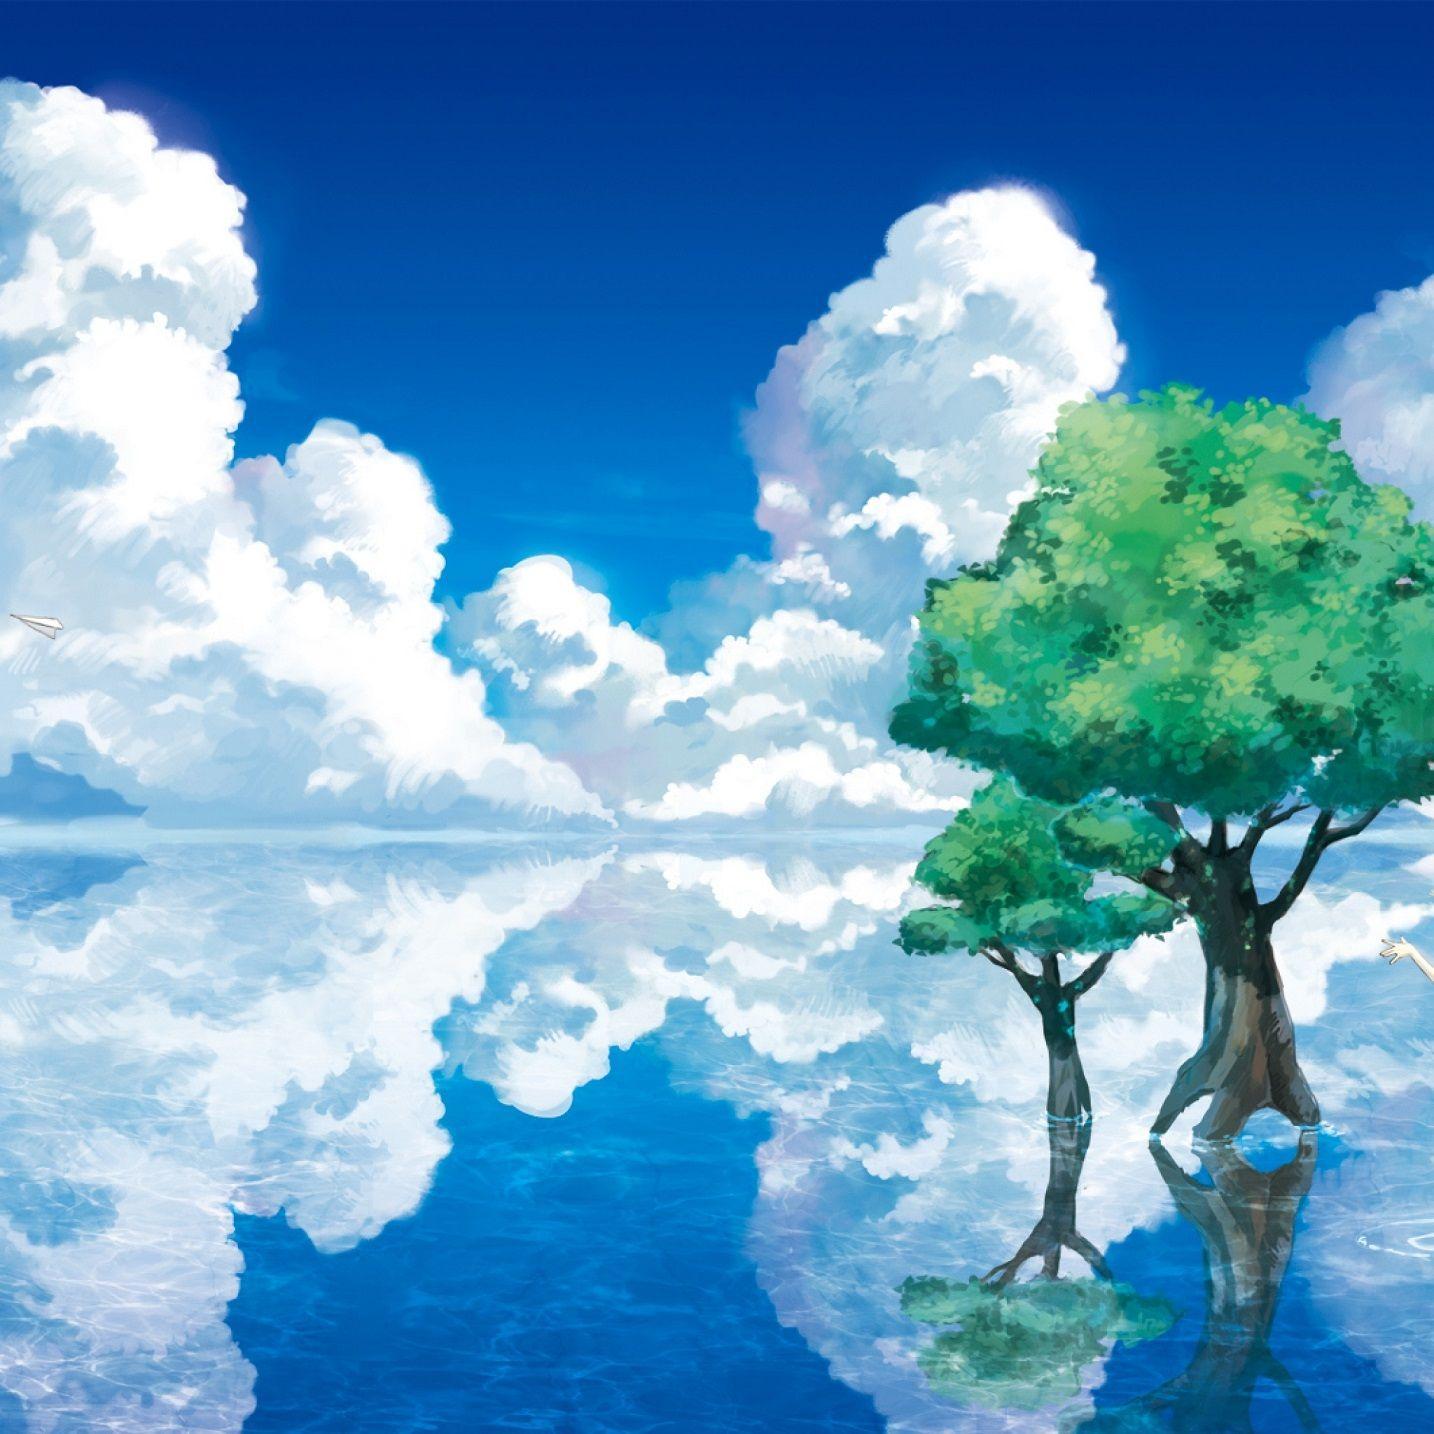 Anime Ipad Wallpapers Top Free Anime Ipad Backgrounds